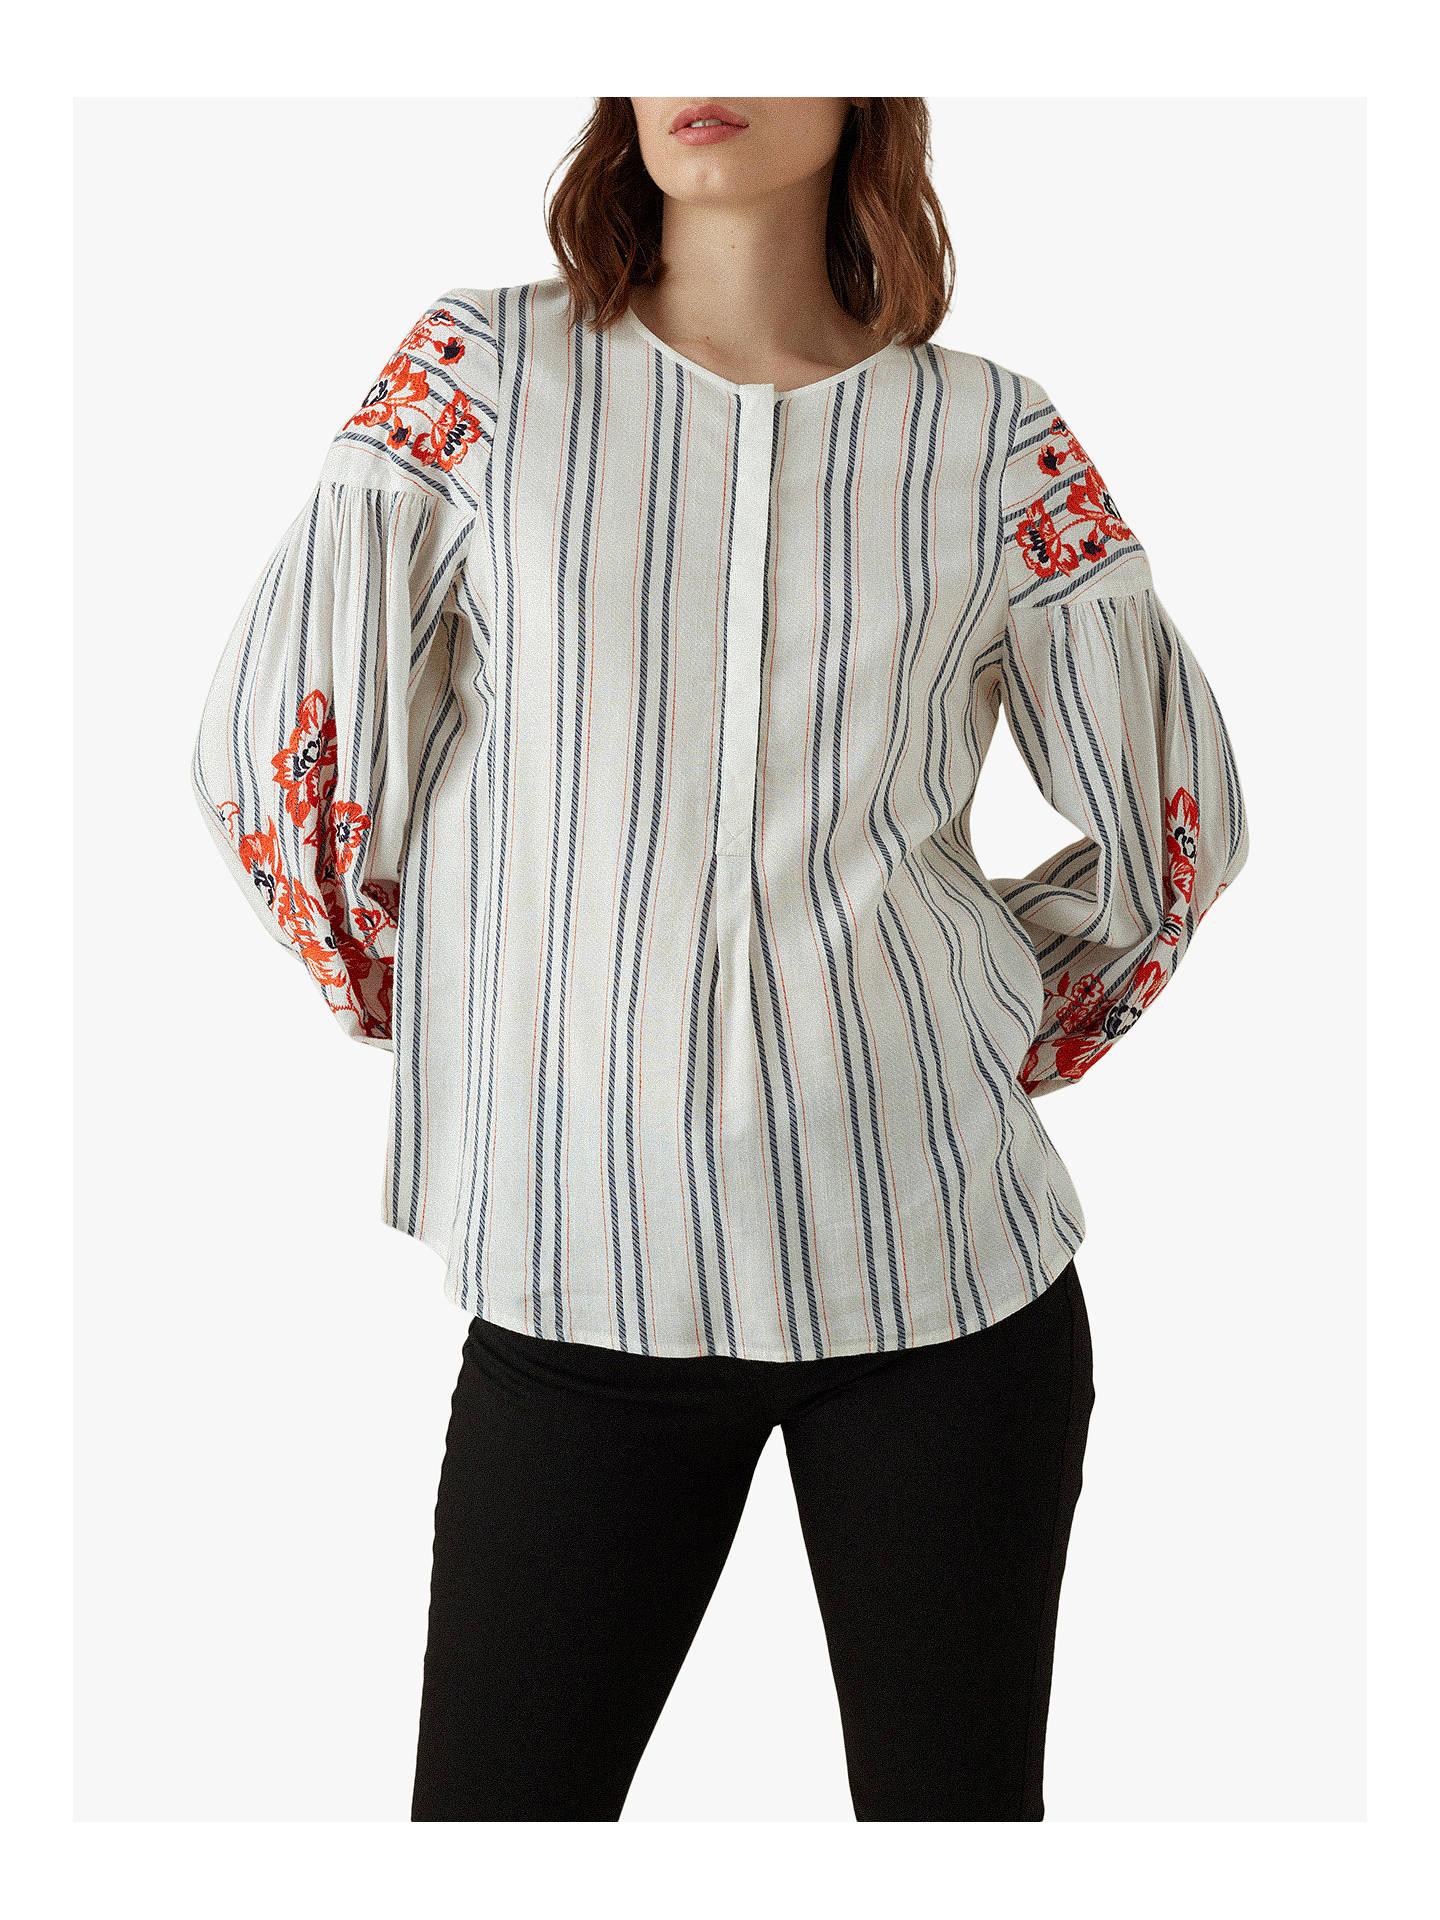 d94bf0432b11 Buy Karen Millen Embroidered Top, White/Multi, 8 Online at johnlewis.com ...